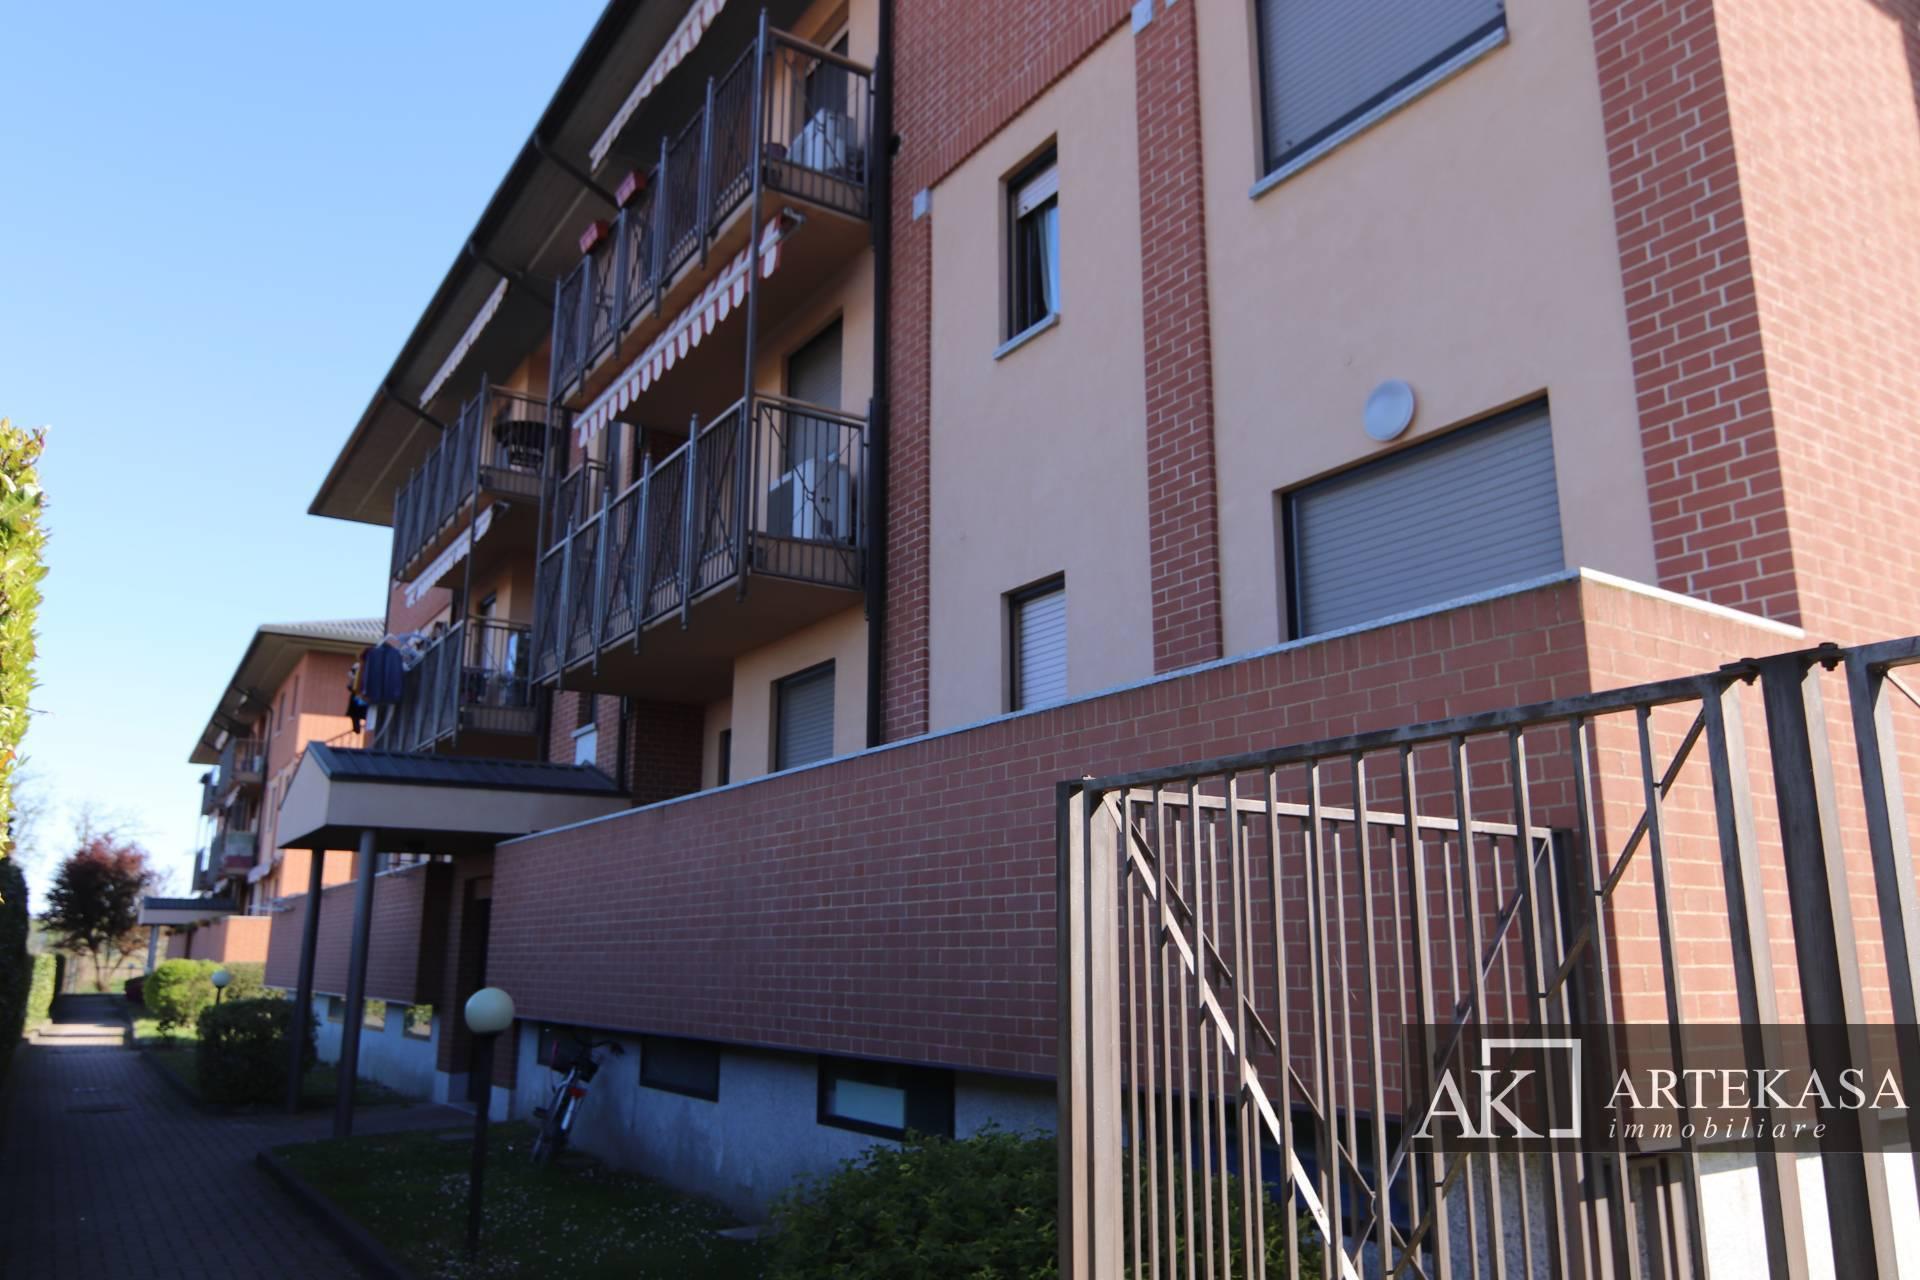 3 Locali Novara - Sant'antonio - Vignale - Veveri